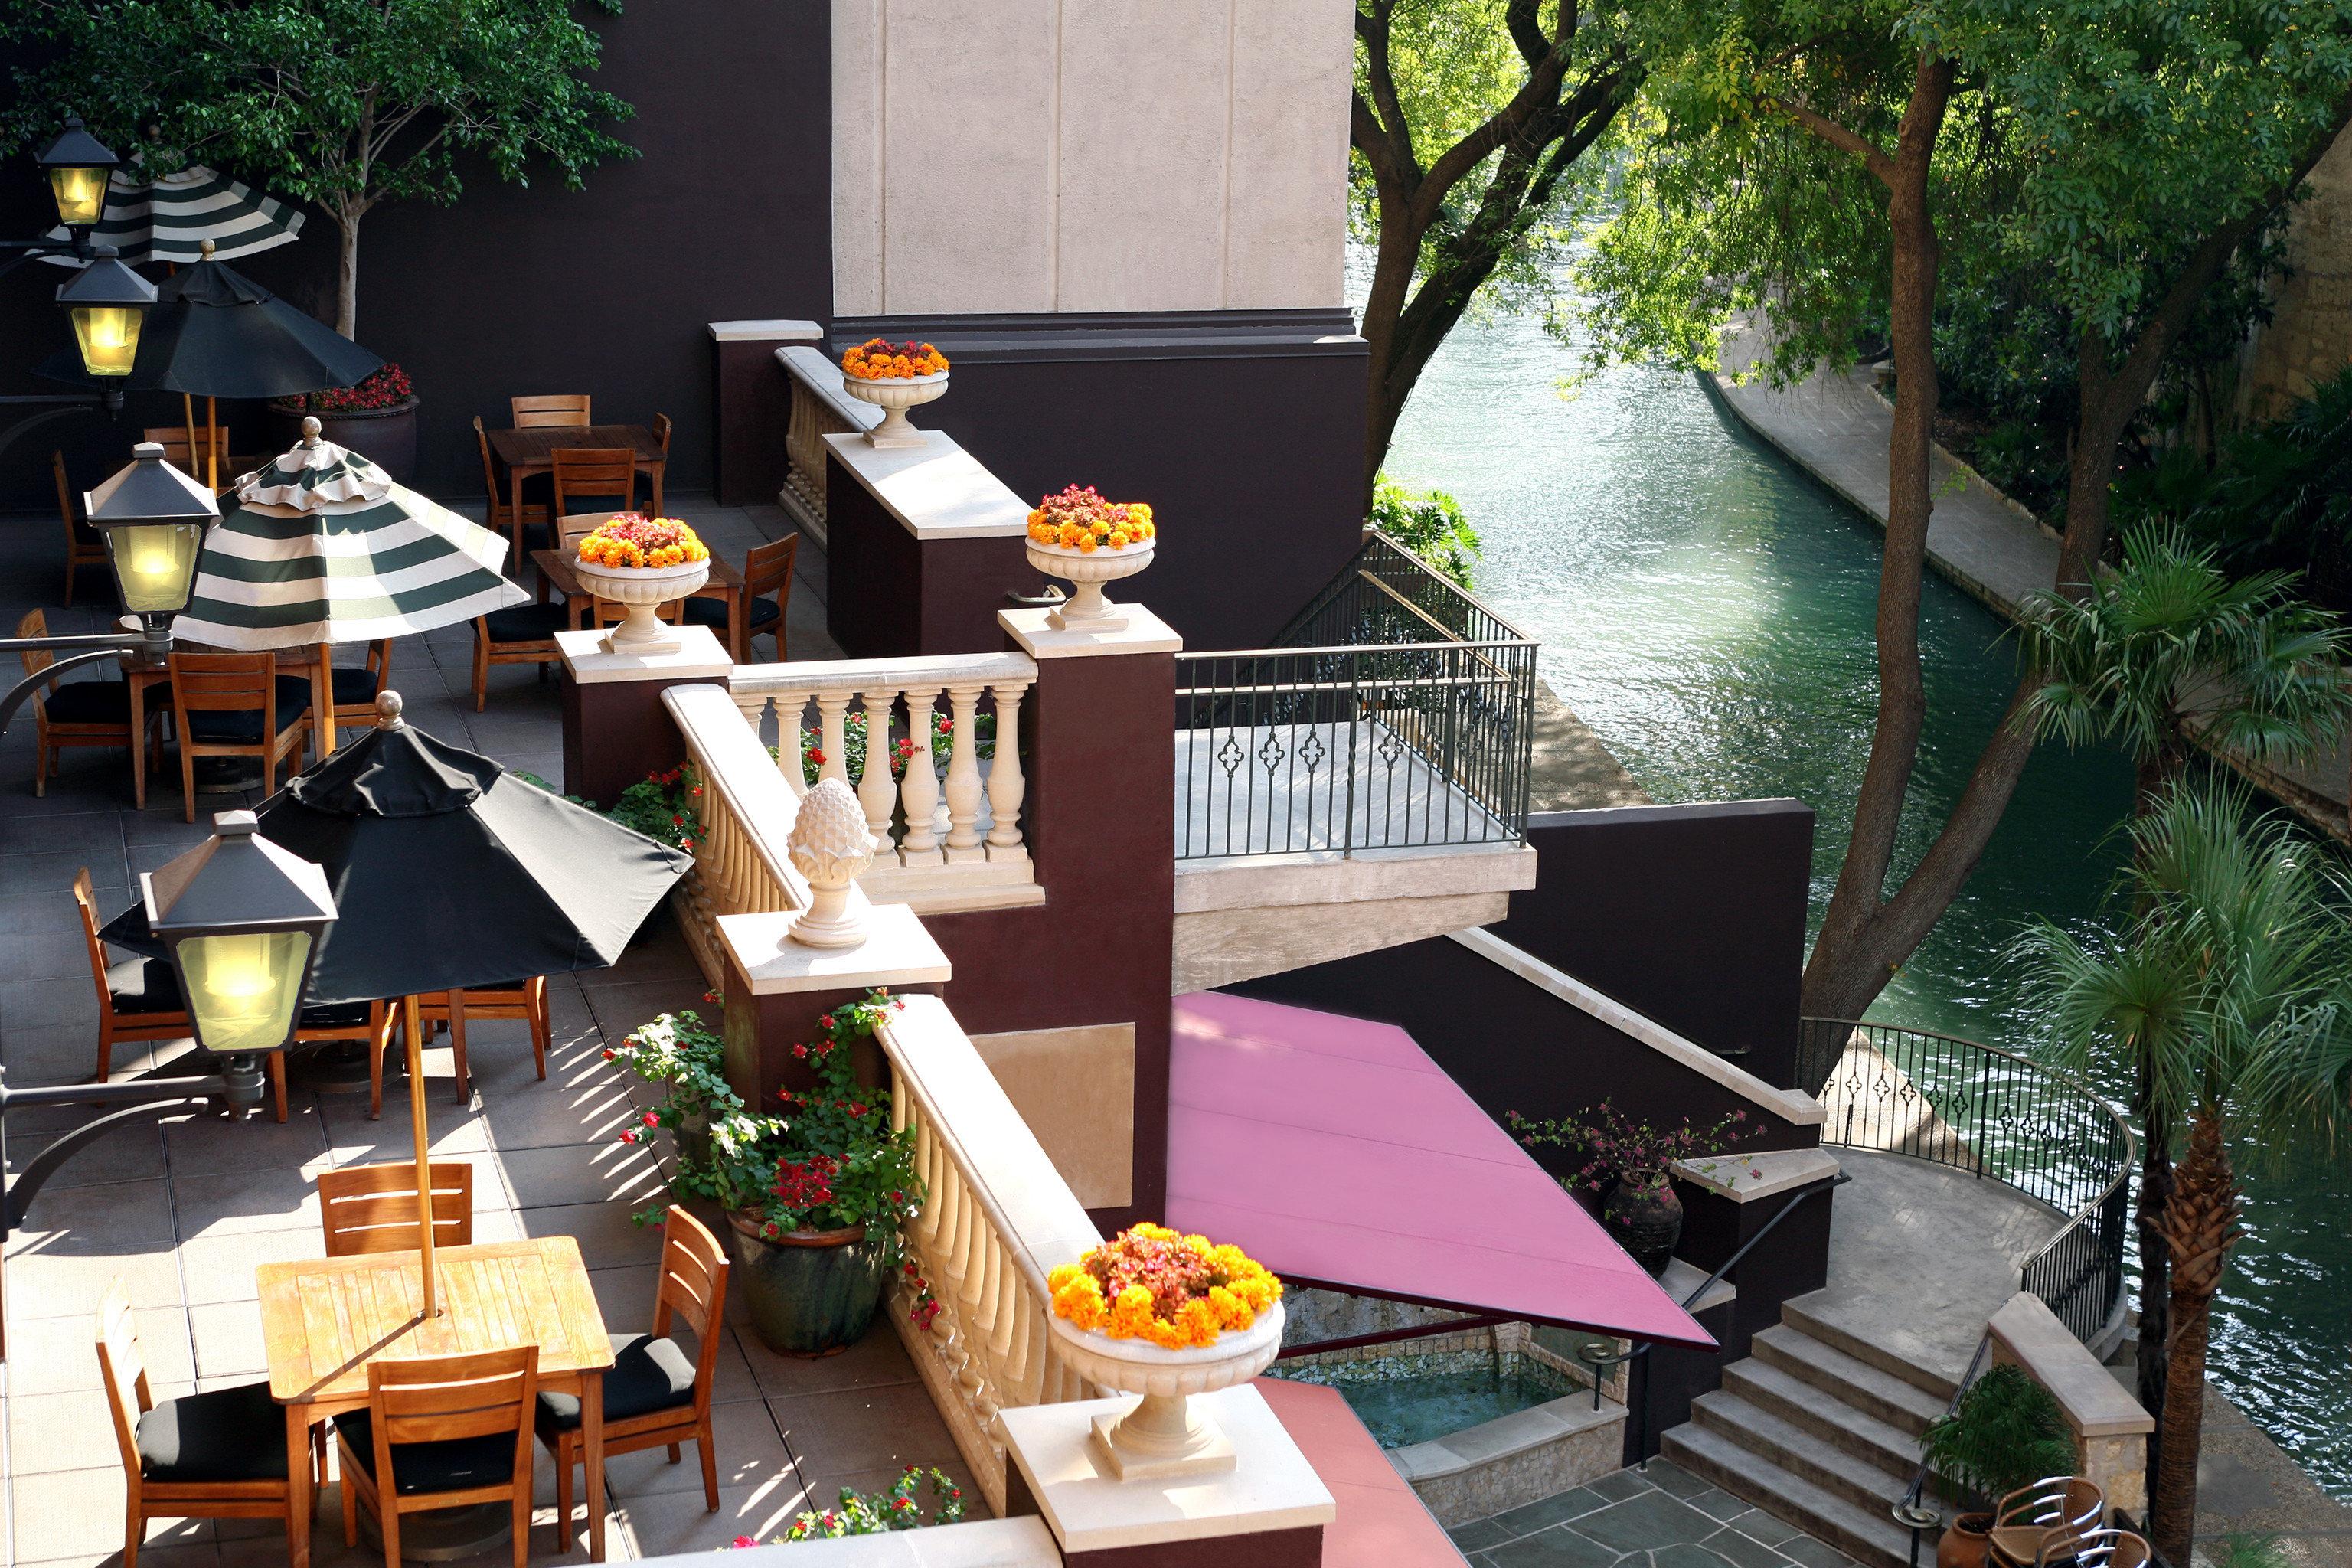 Balcony Deck Hotels Lounge Modern Patio Terrace Trip Ideas tree restaurant Resort Dining home